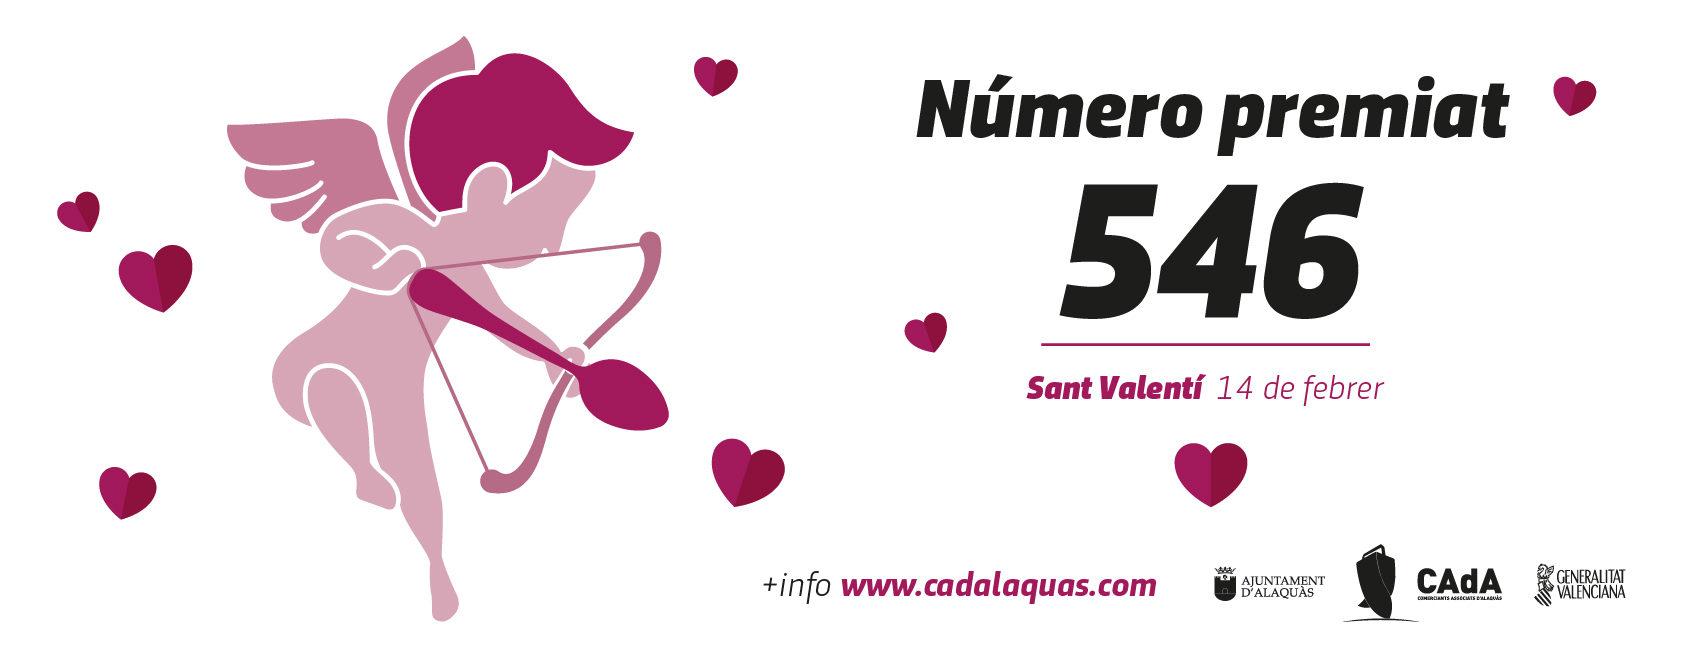 banner_WEB_premio-ONCE-sanvalentin- 546-sorteo-CAdA